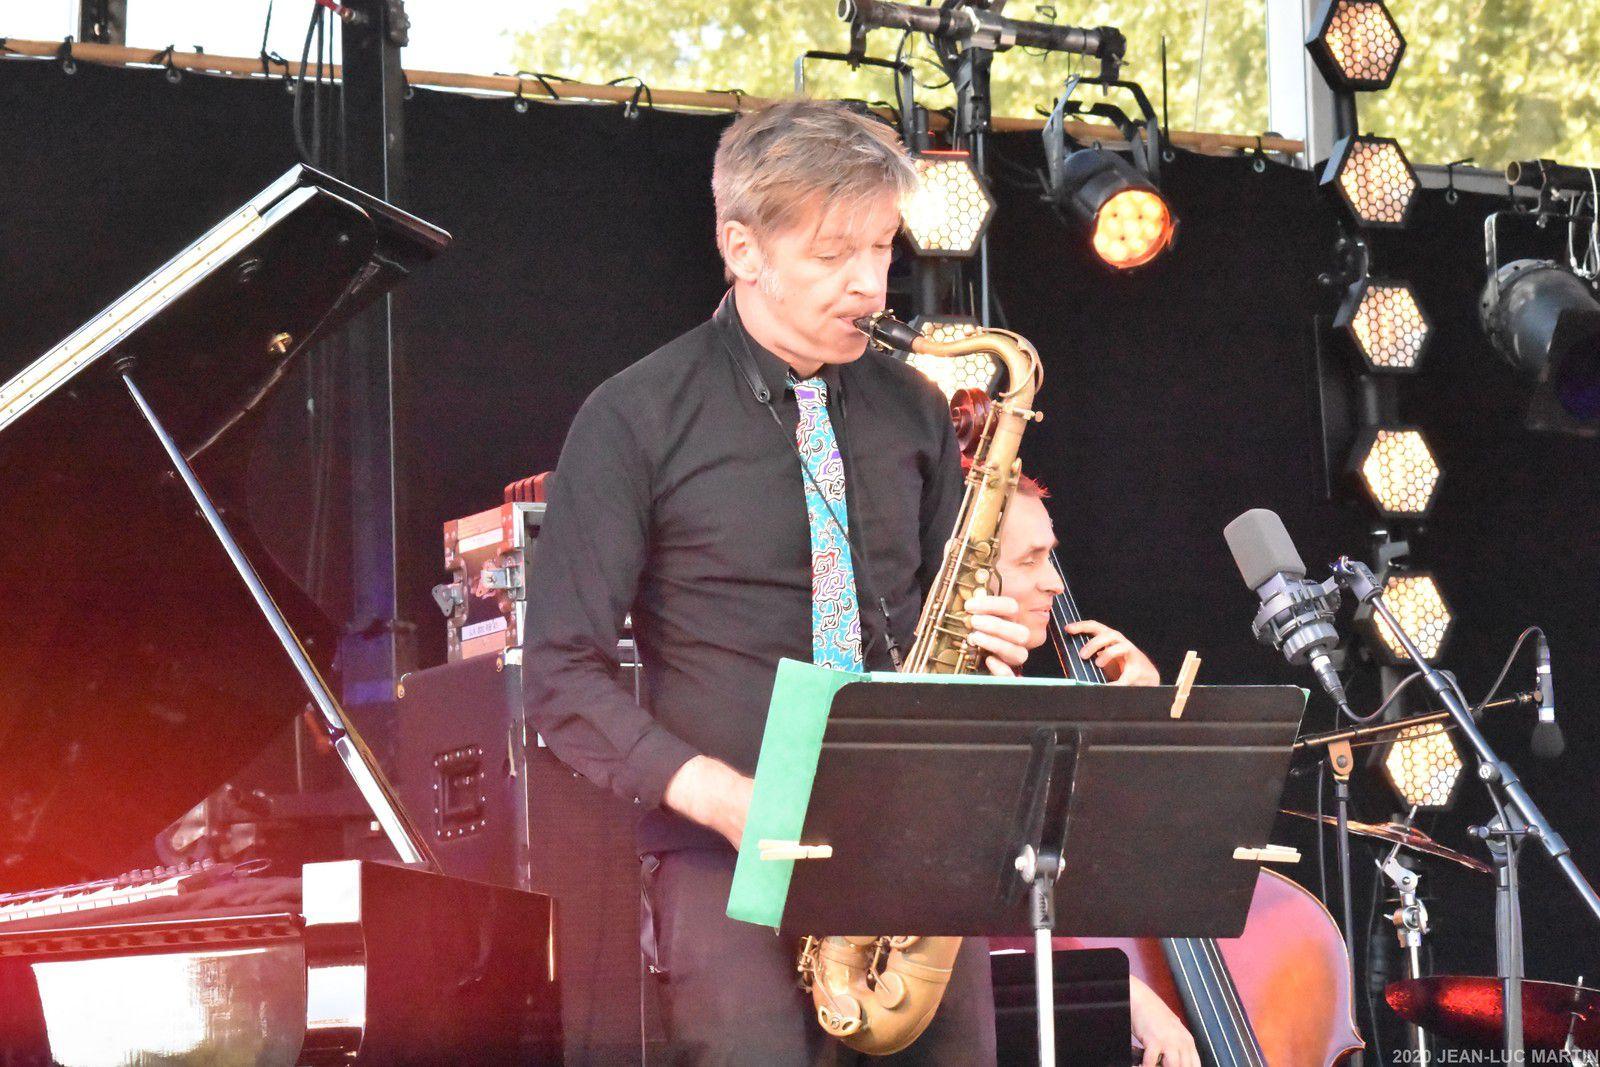 DANIEL ERDMANN: MUSICIEN EUROPEEN 2020 POUR L'ACADEMIE DU JAZZ